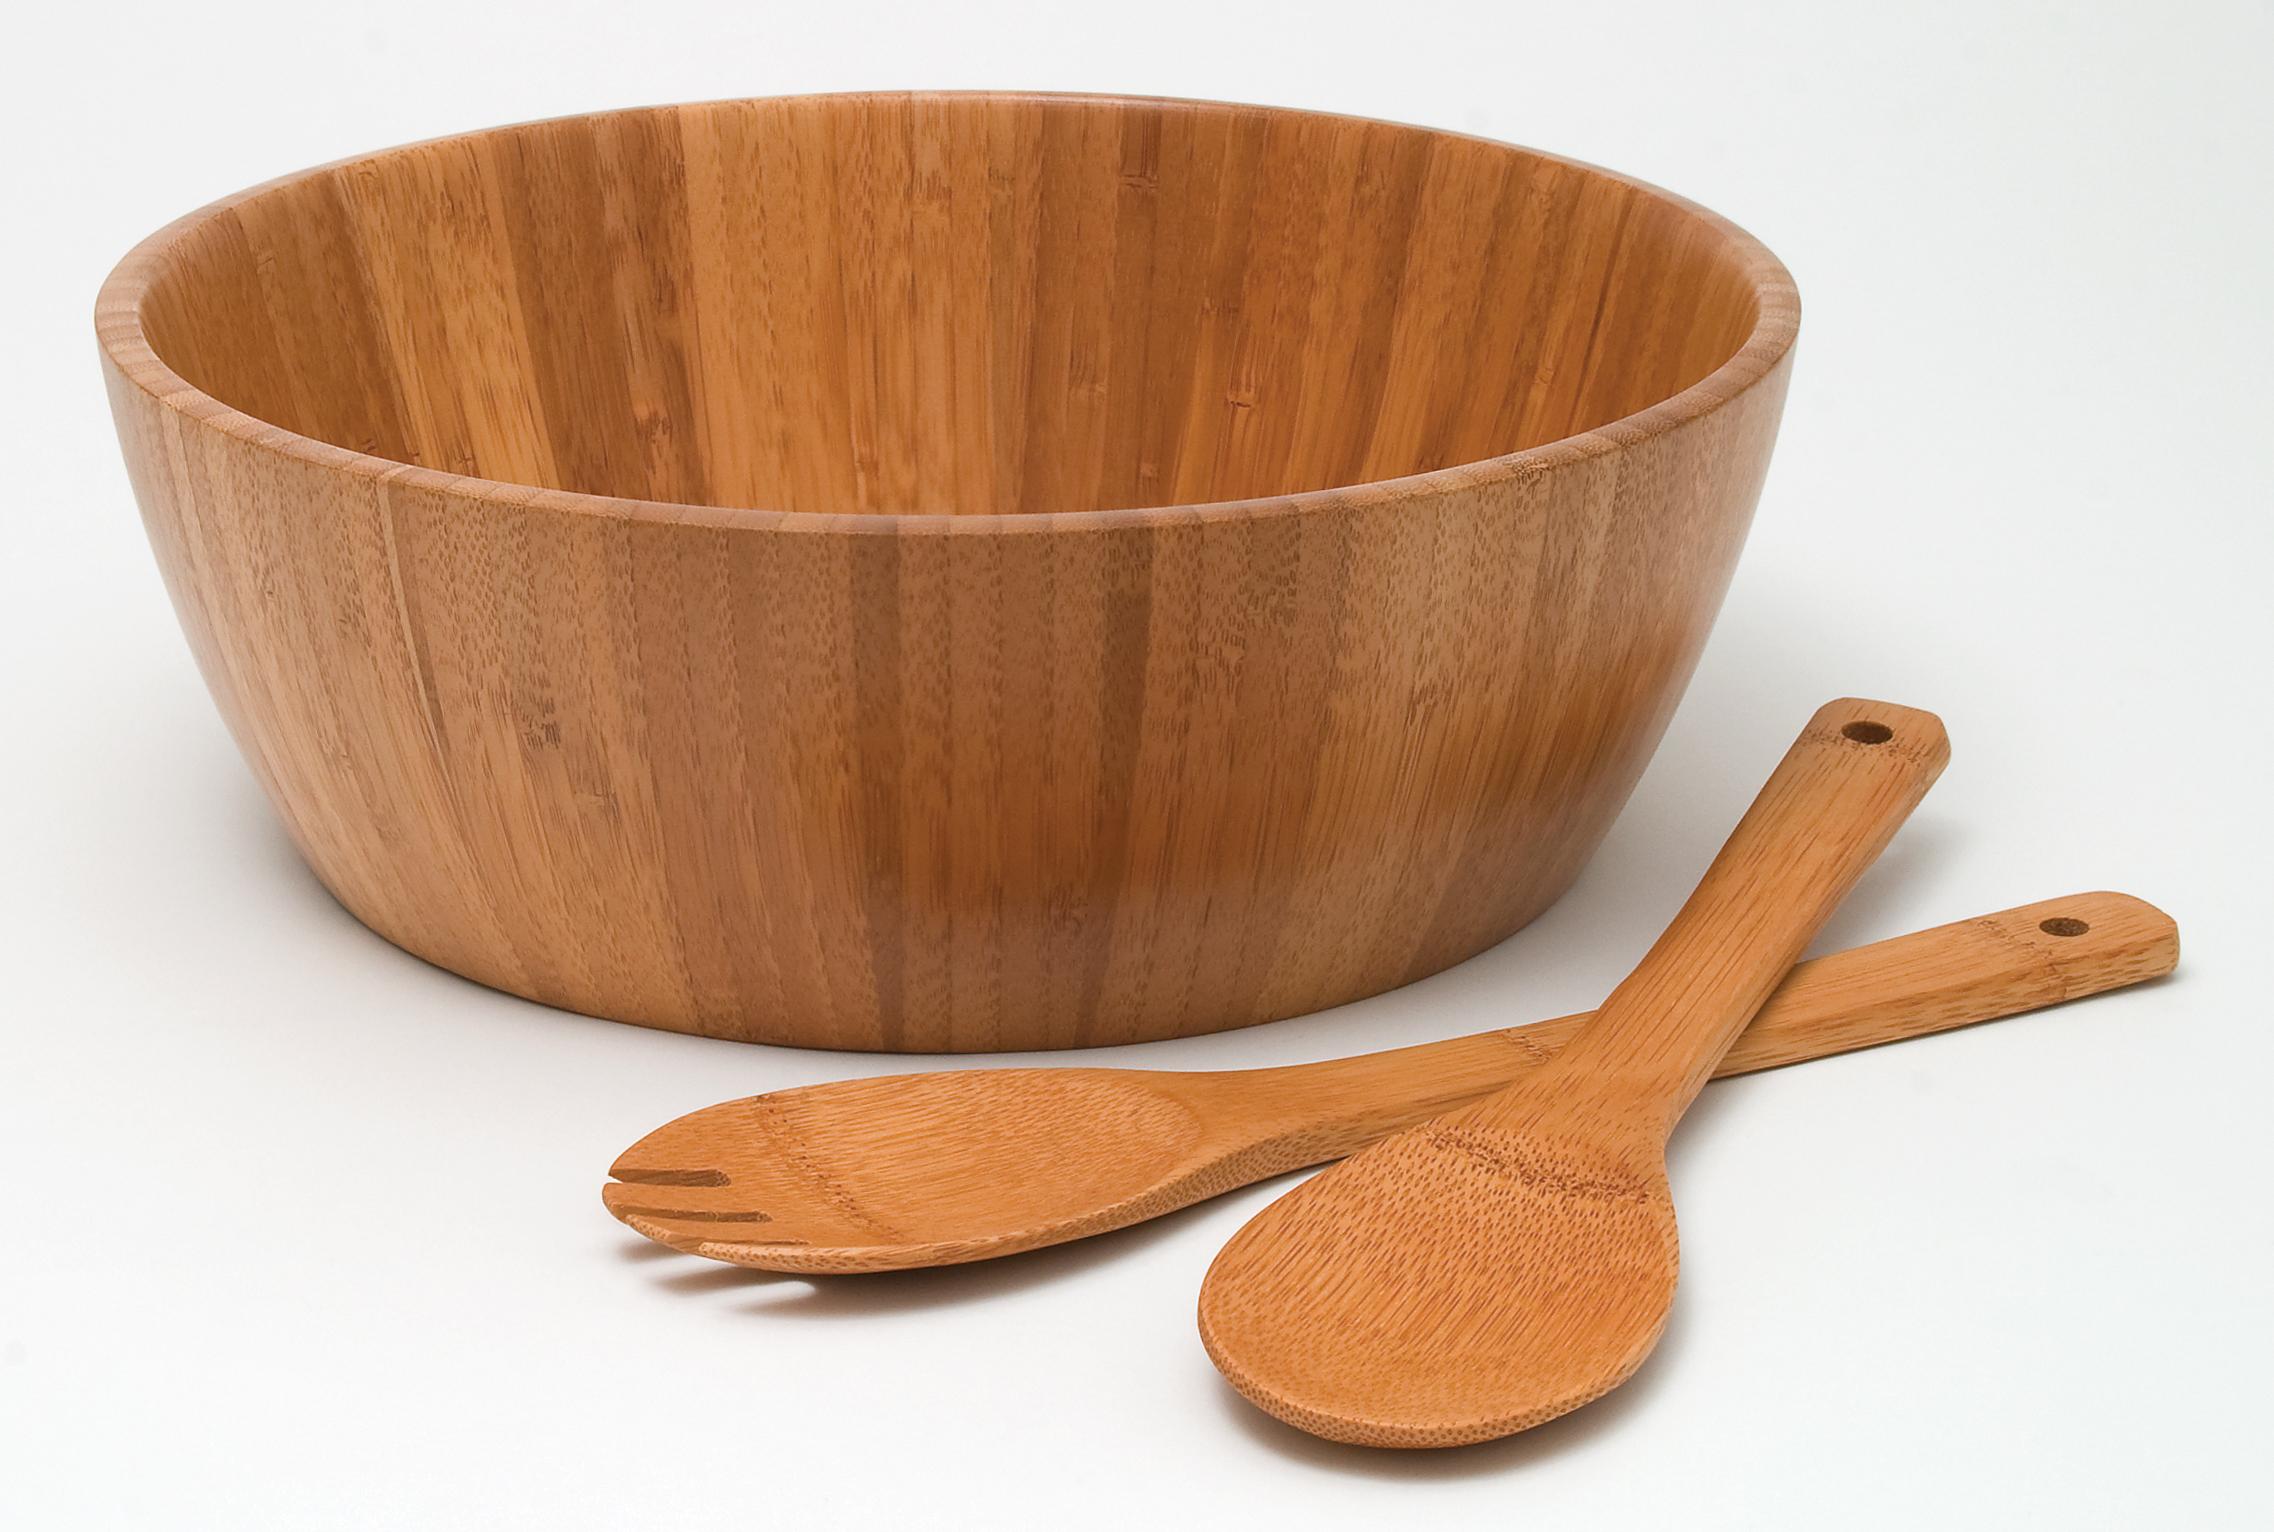 bamboo salad bowl with servers 3 piece set lipper international bowl server sets - Wooden Salad Bowl Set